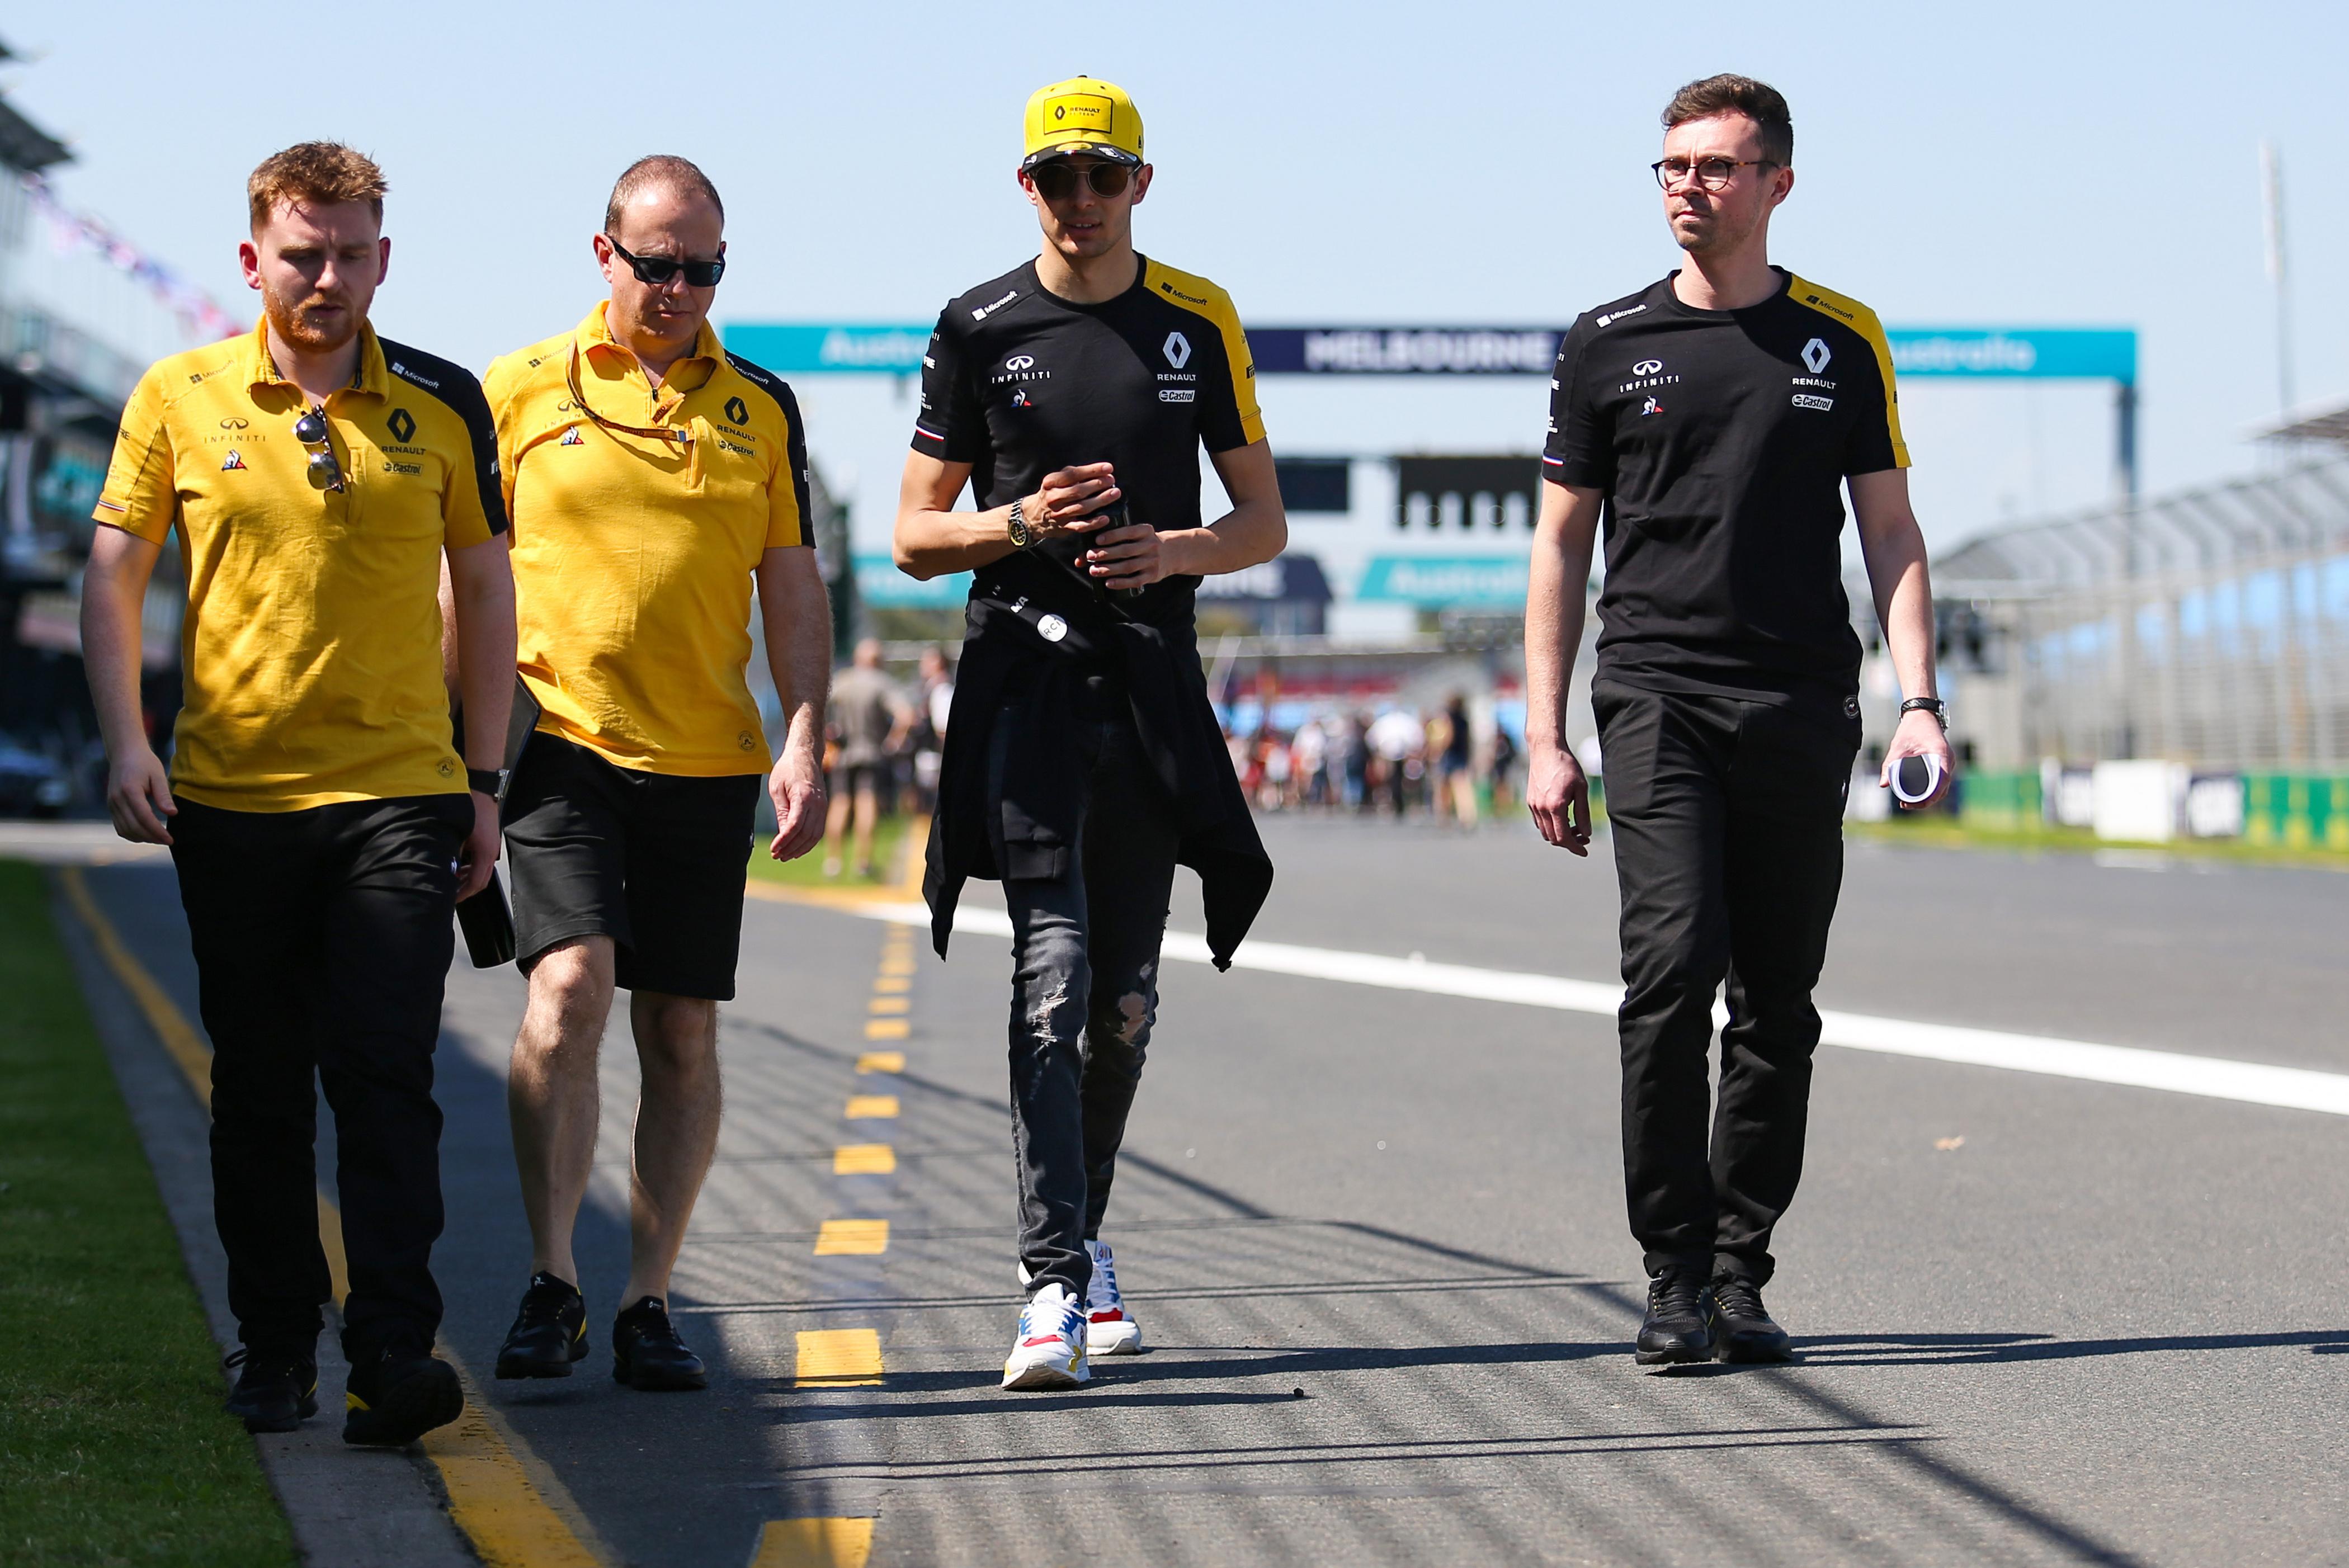 F1 Covid19 Update 3: Australian GP cancelled